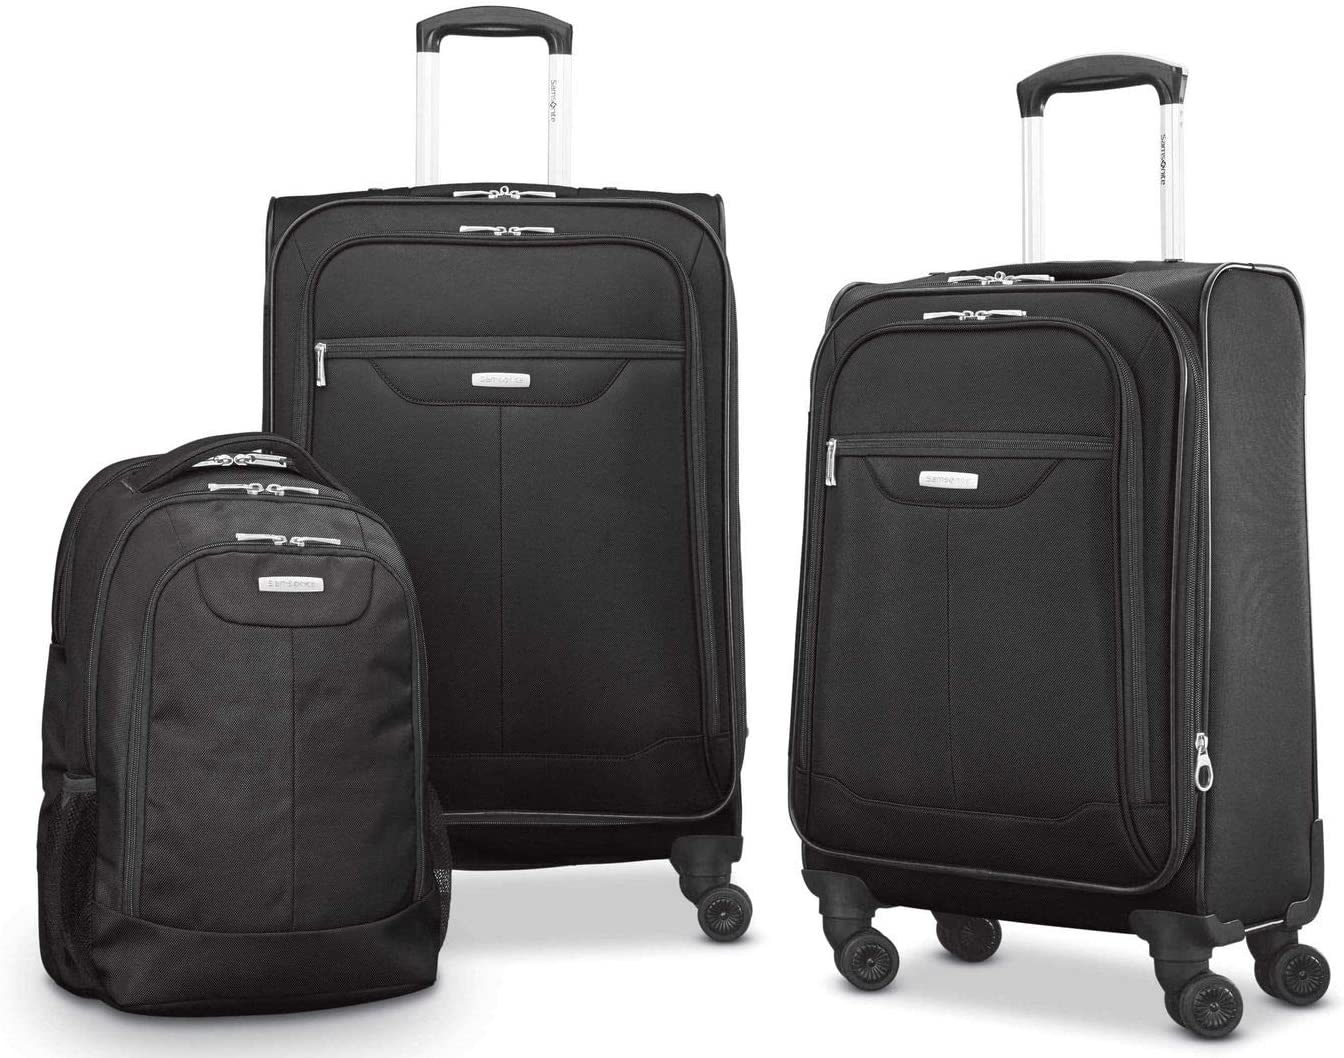 Samsonite Tenacity Luggage Set